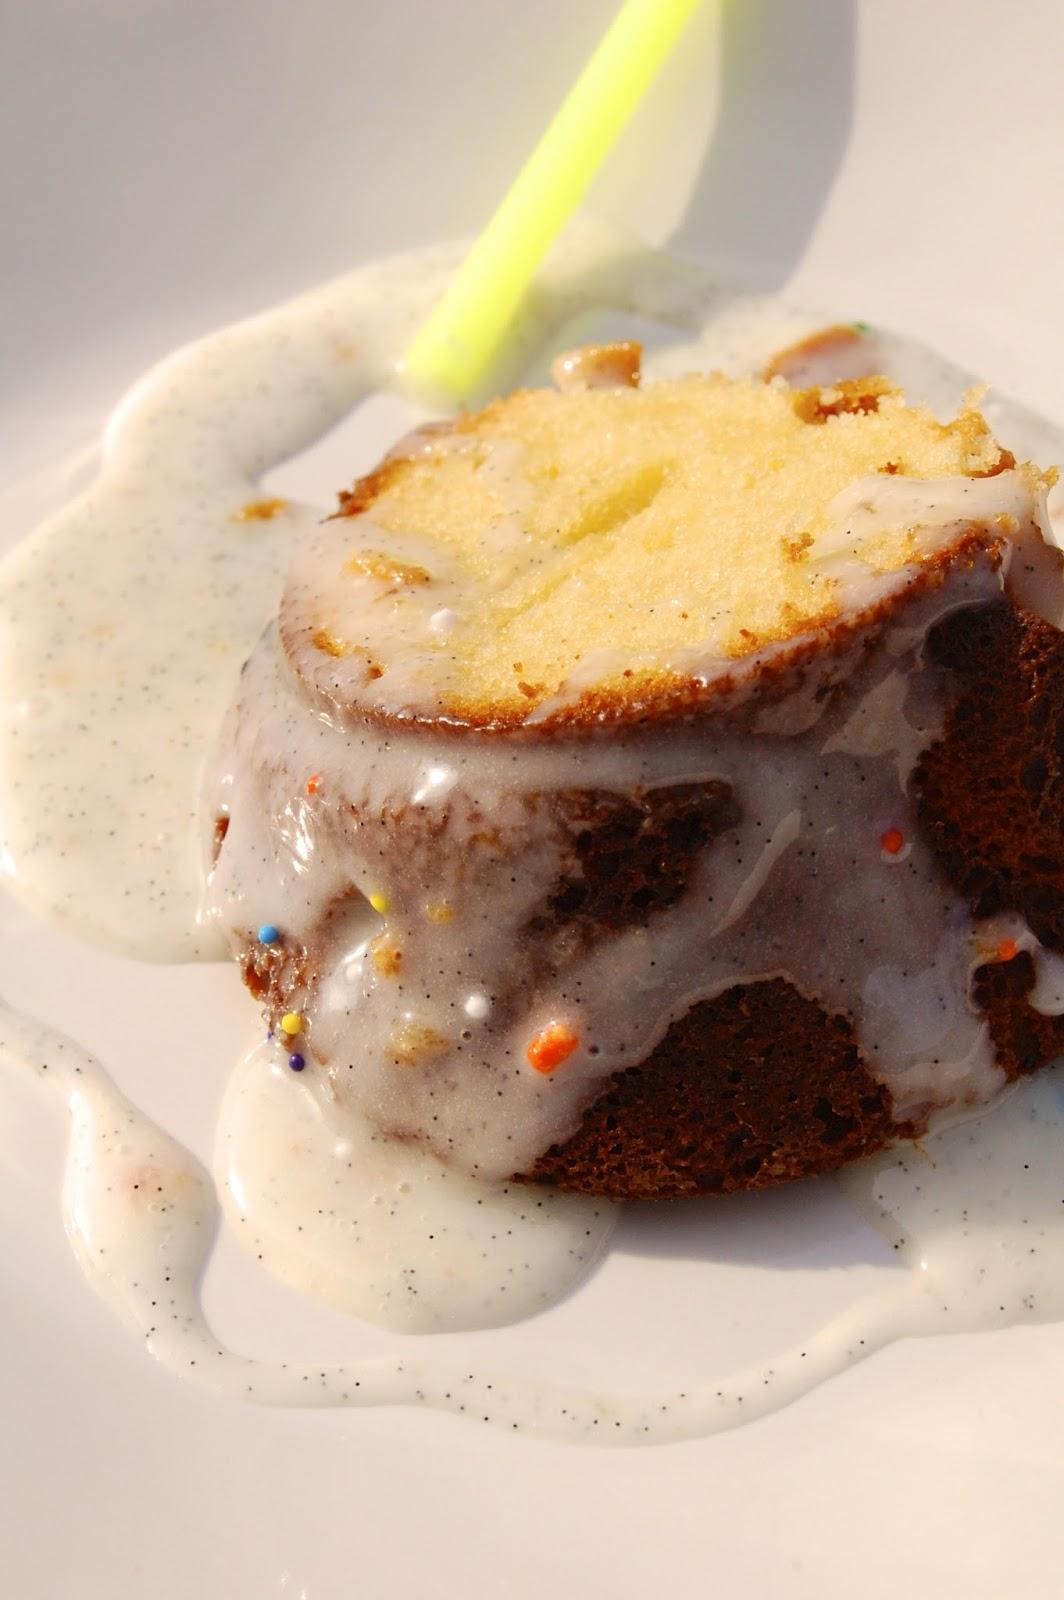 30/30 - #10 Gluten Free Almond Cake